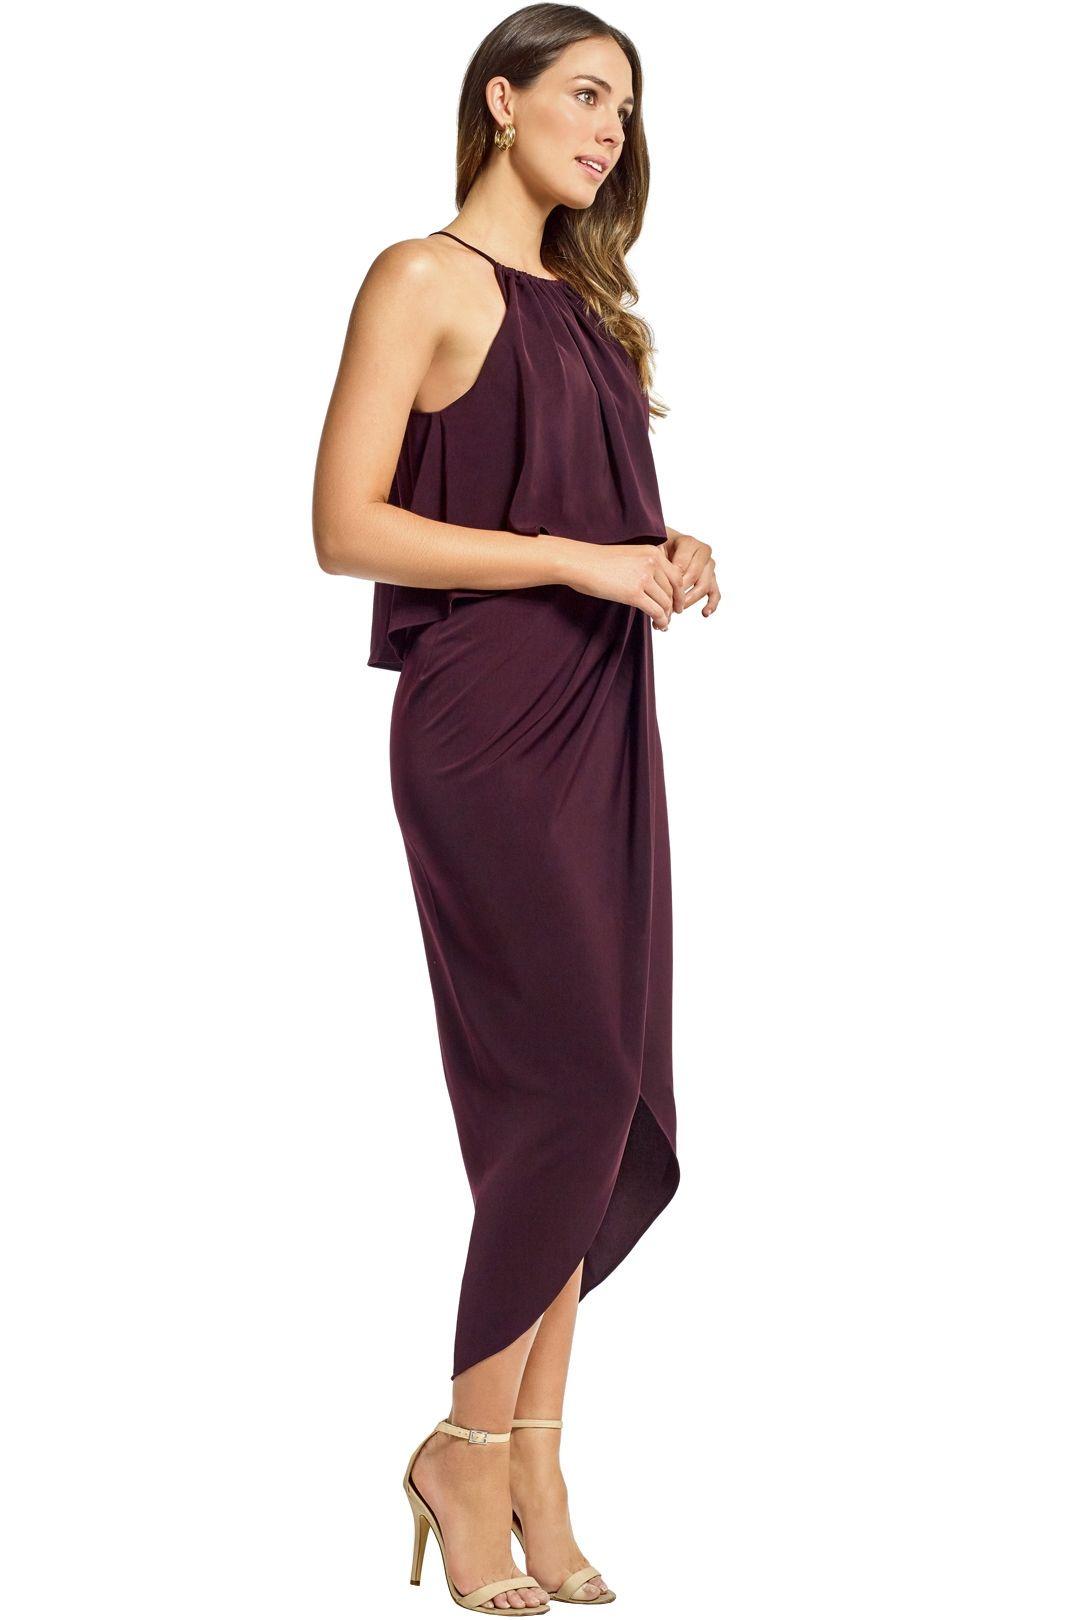 Shona Joy - Frill High Neck Drape Maxi Dress - Aubergine - Side